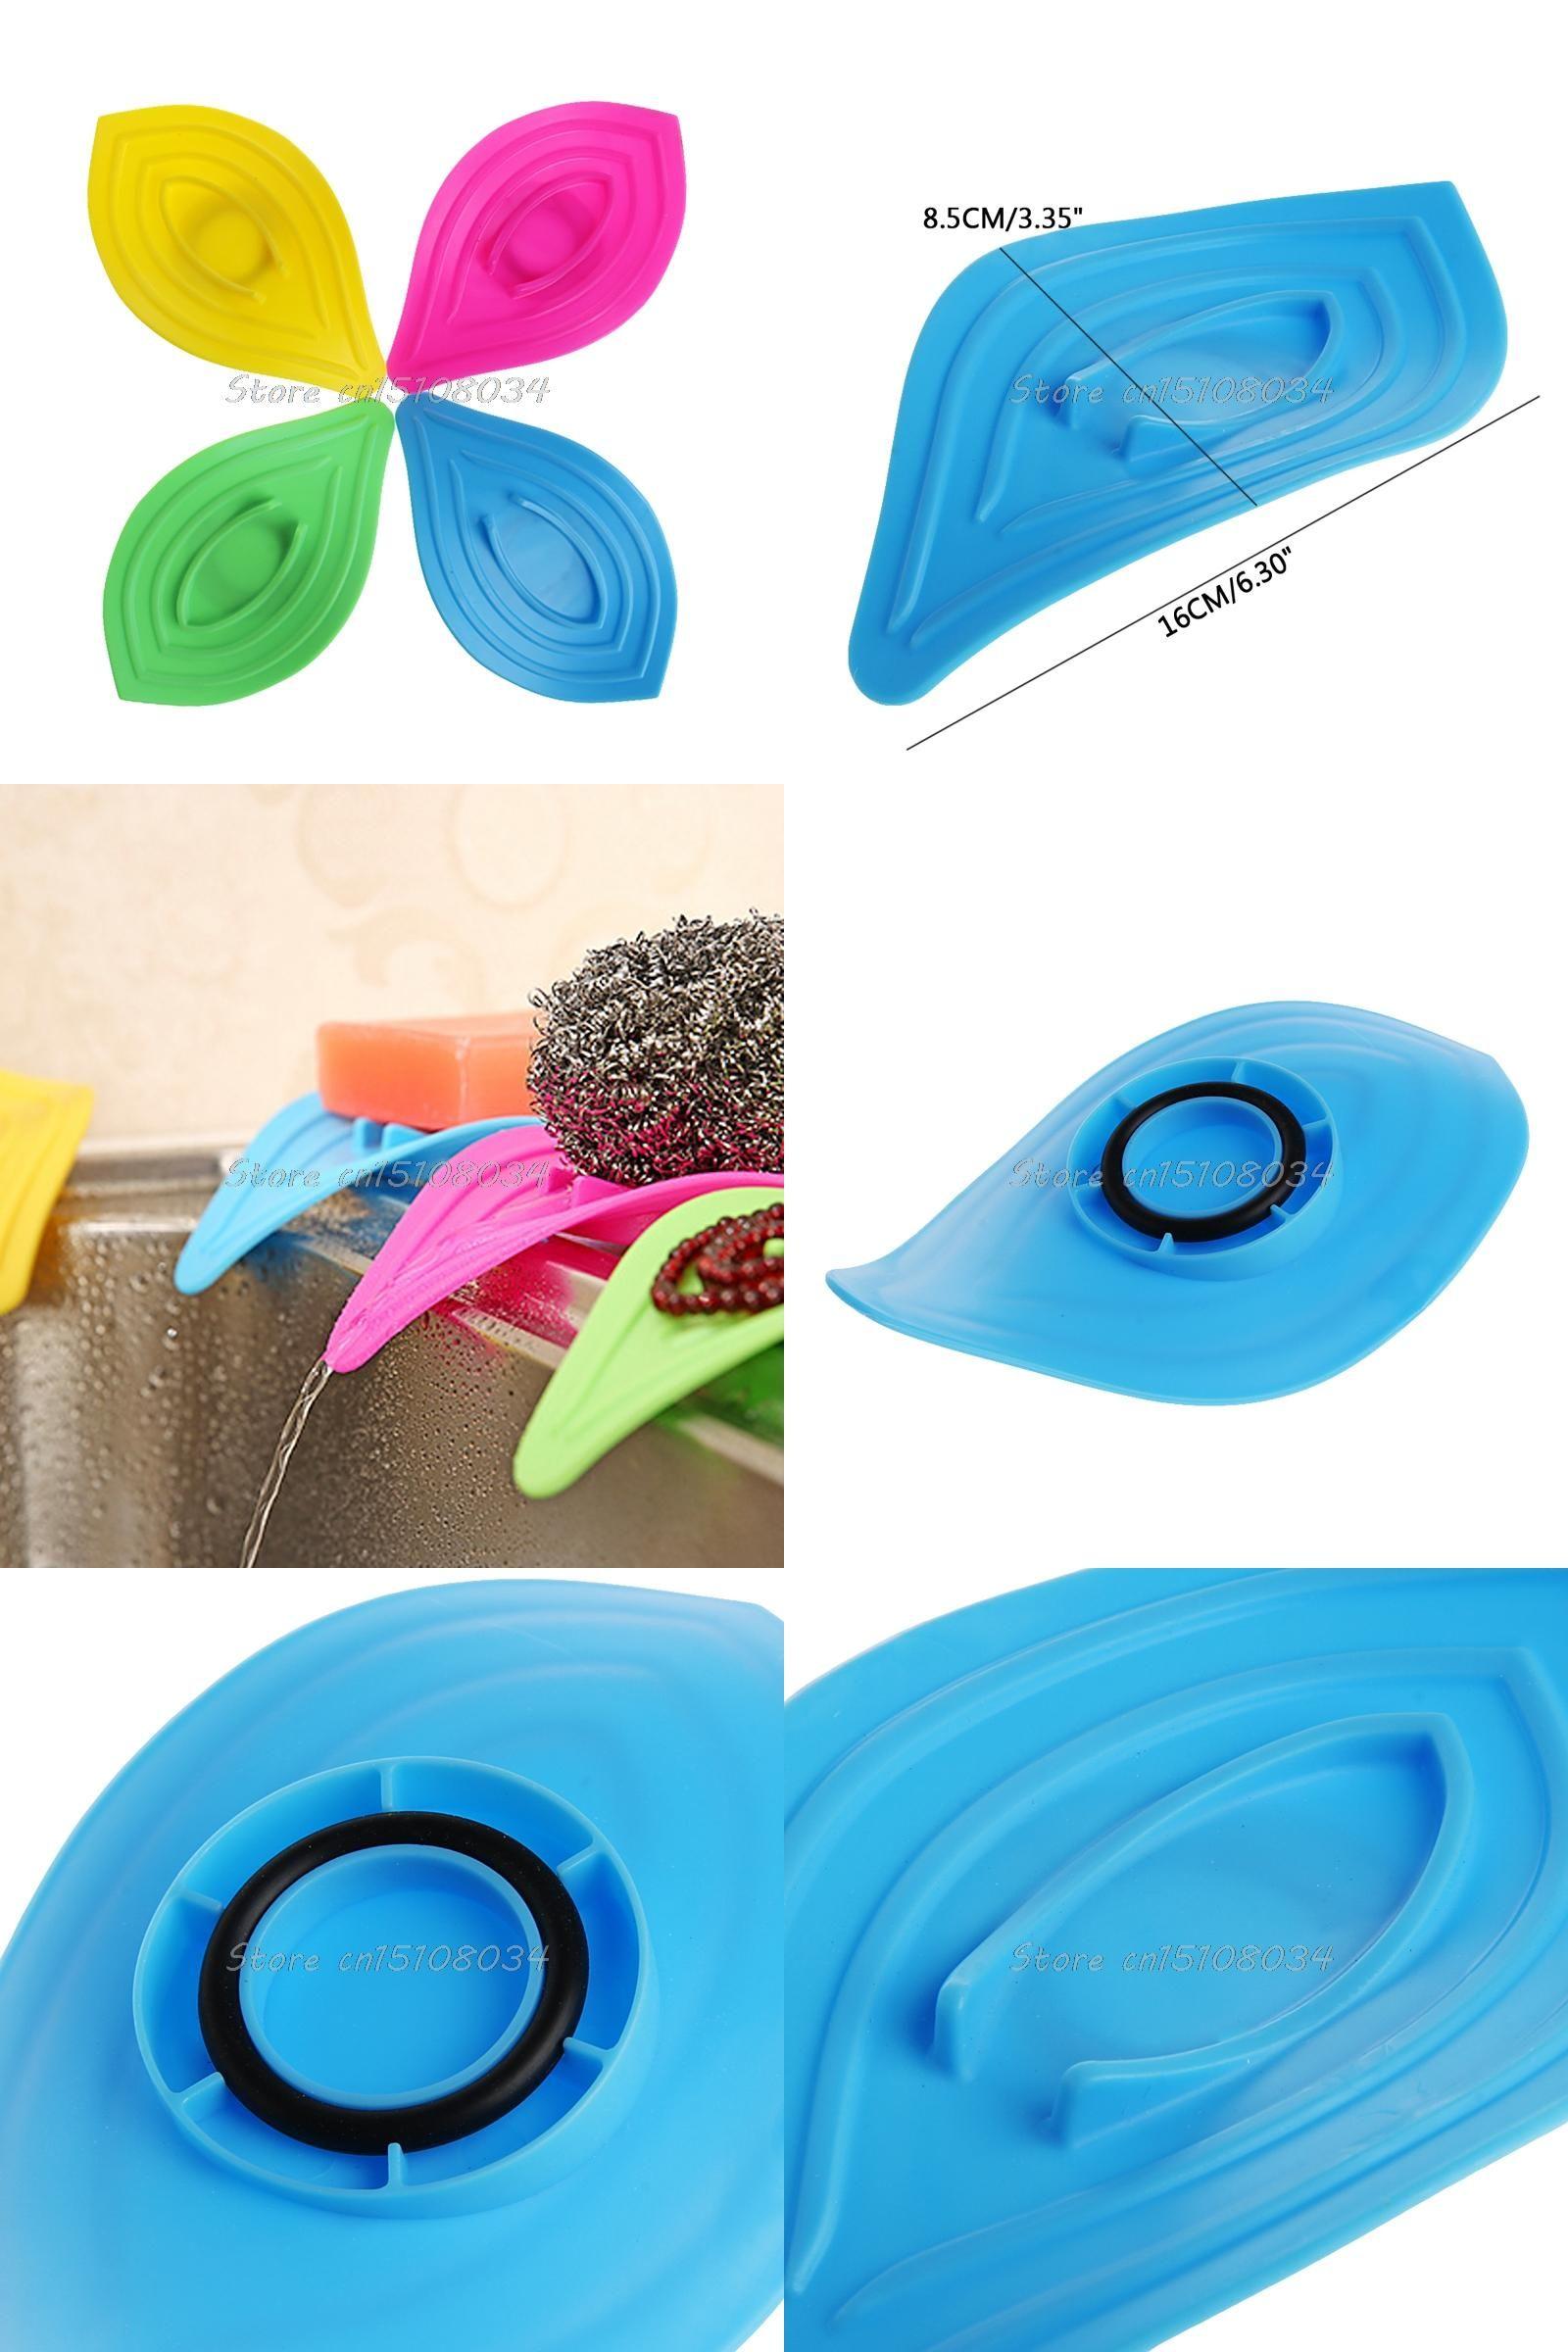 Visit to Buy] Ring Leaves Soap Box Anti-Slip Drain Clean Soap Dish ...